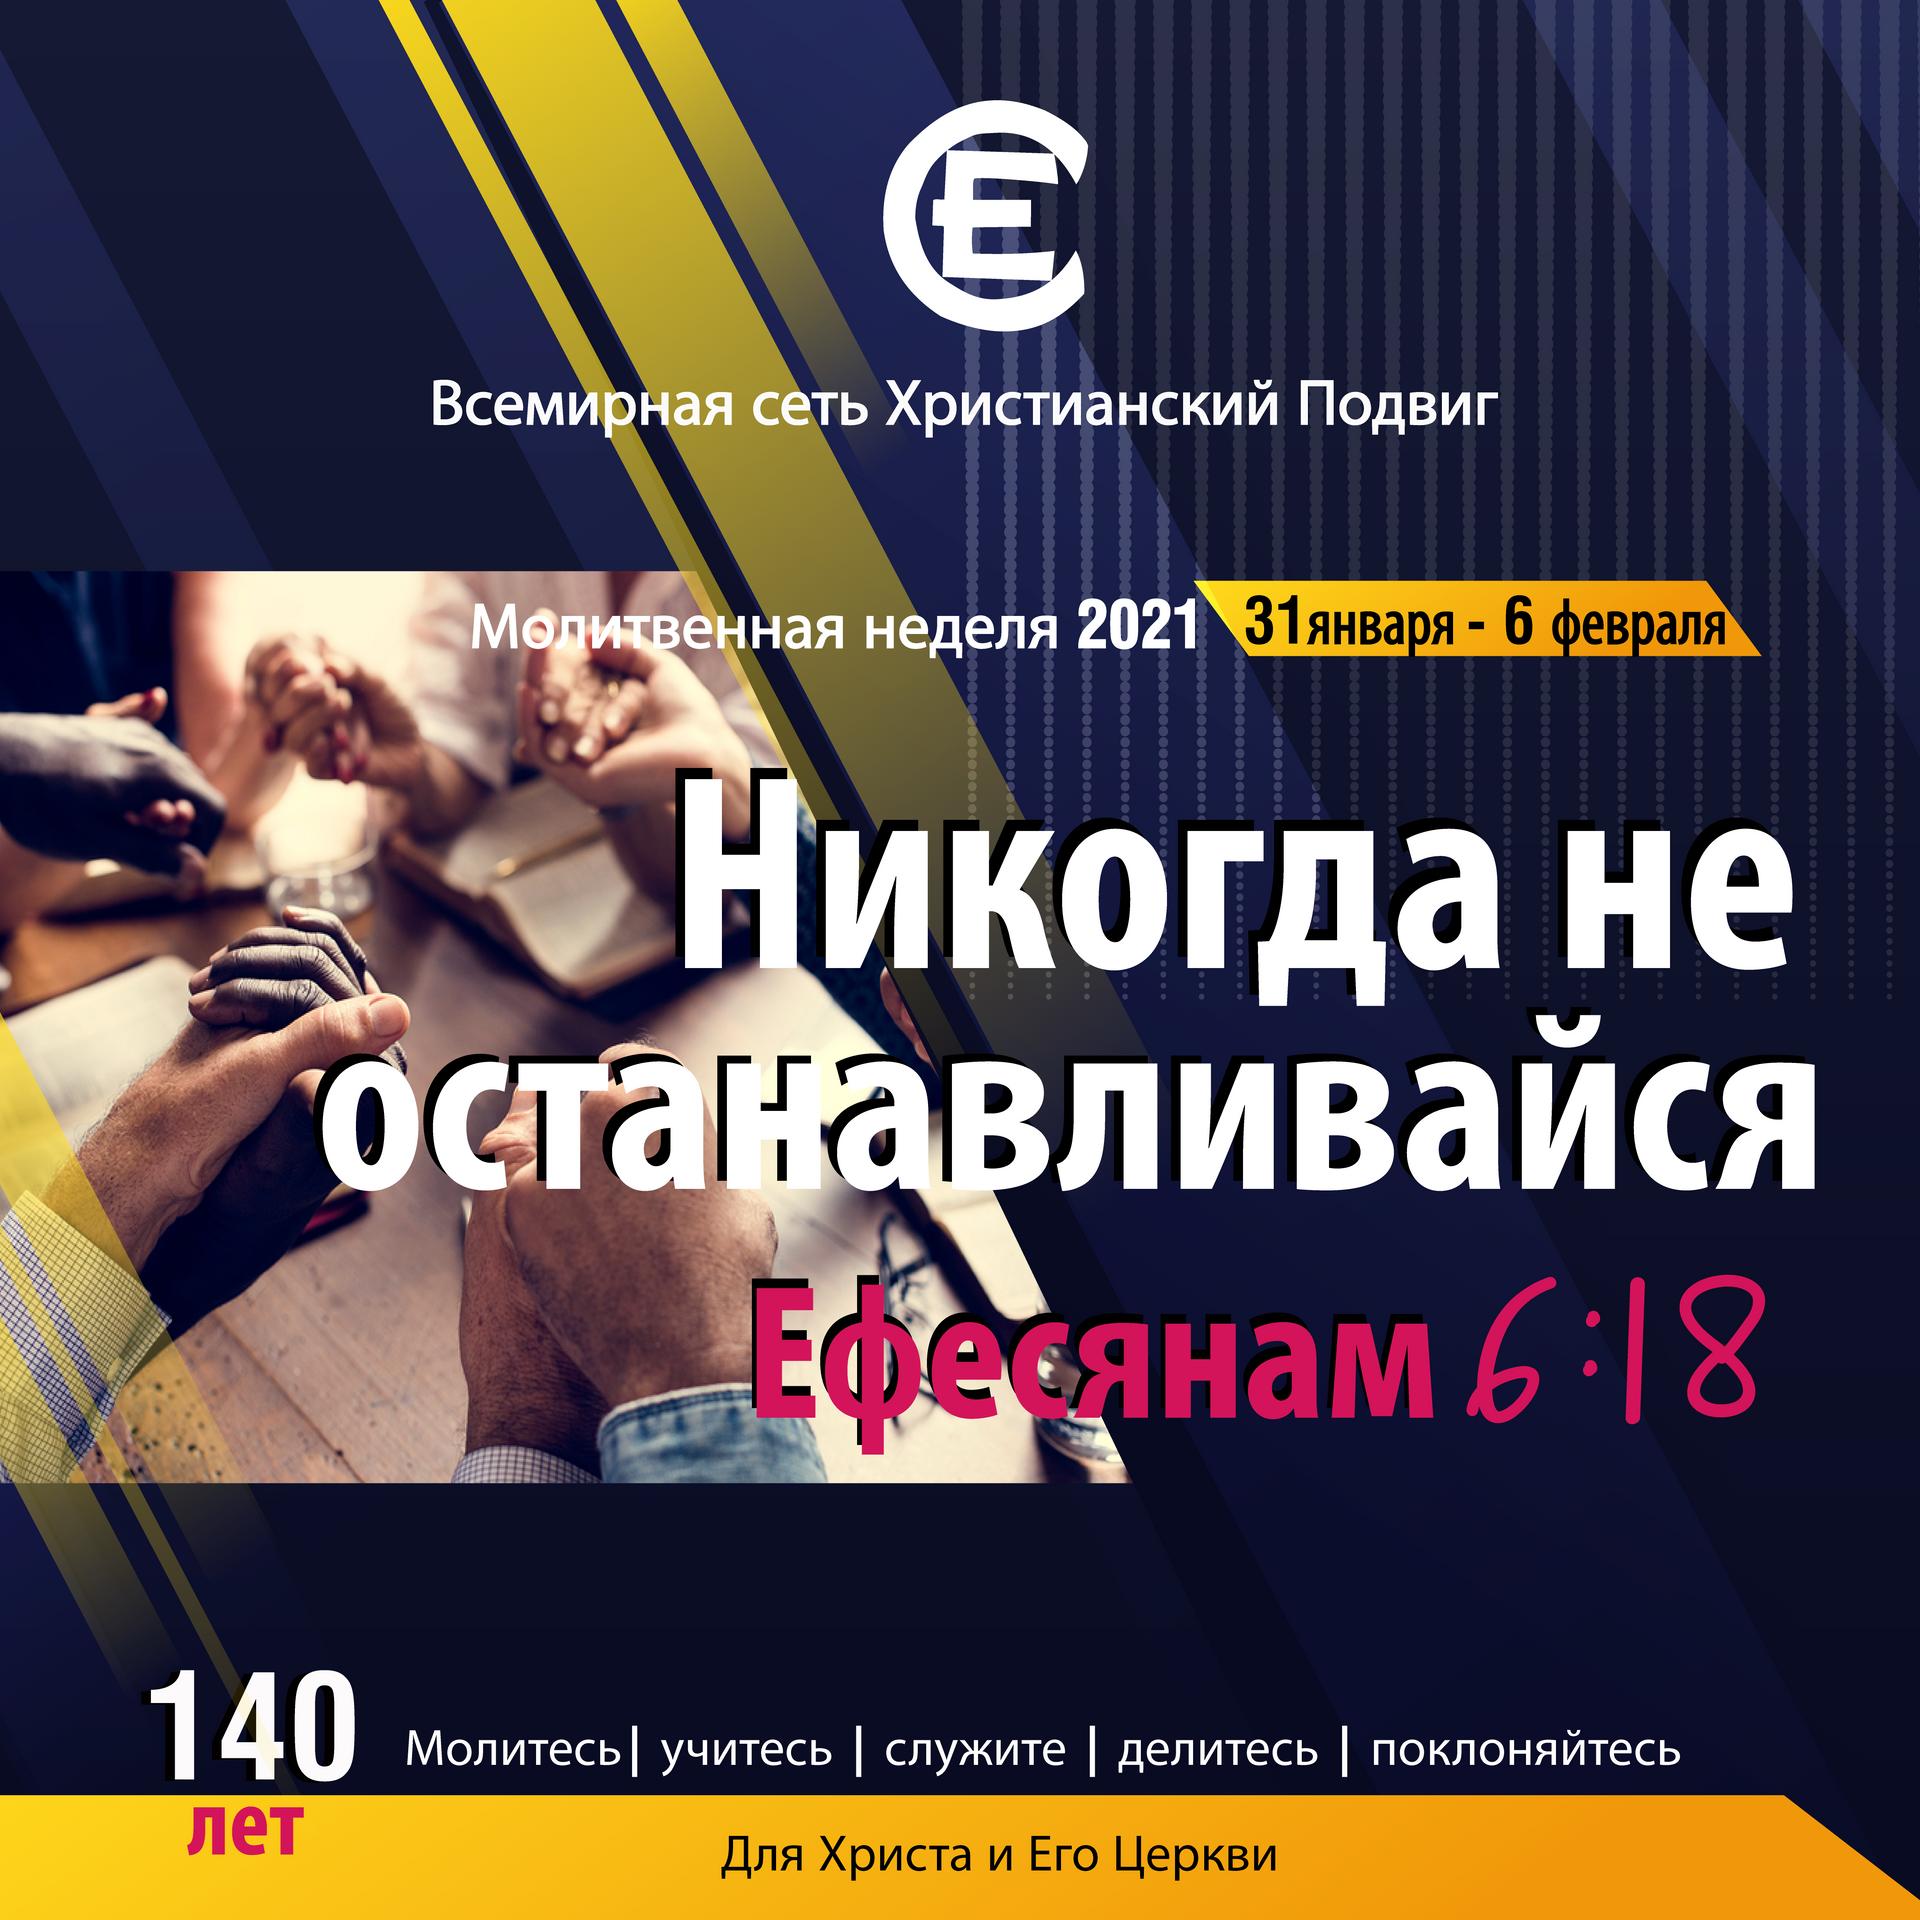 Russisch (Flyer)